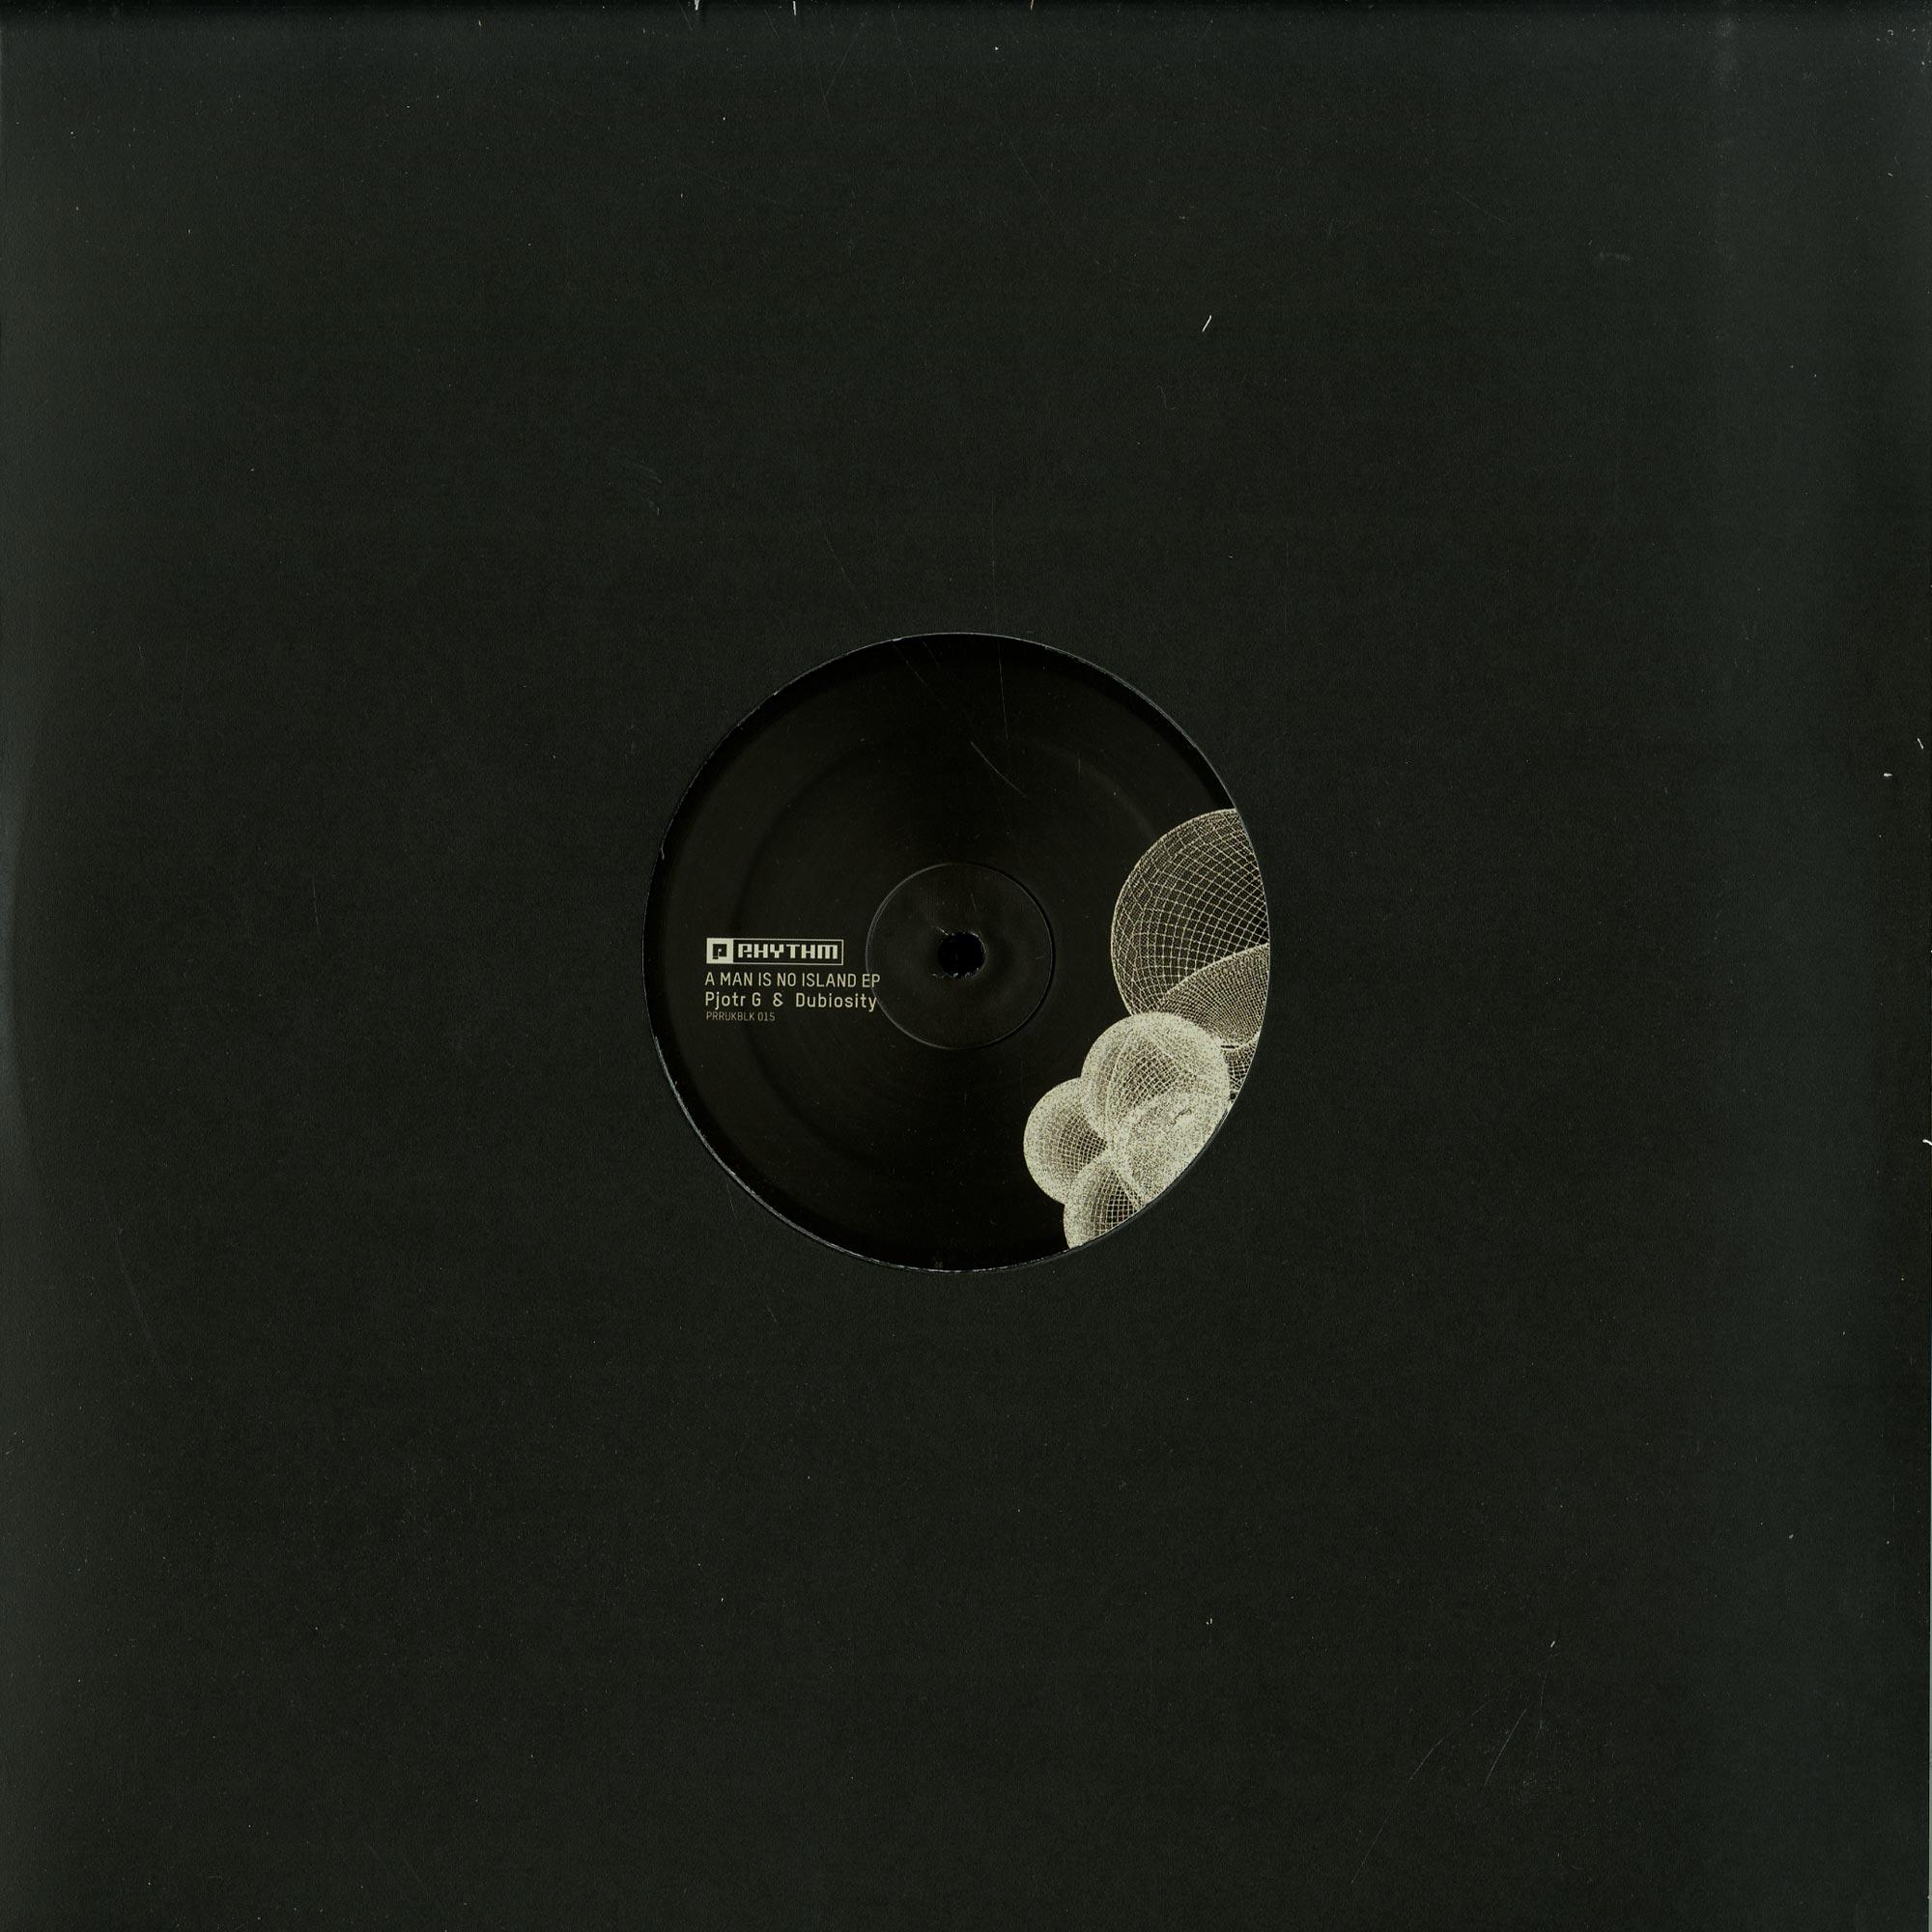 Dubiosity & Pjotr G - A MAN IS NO ISLAND EP